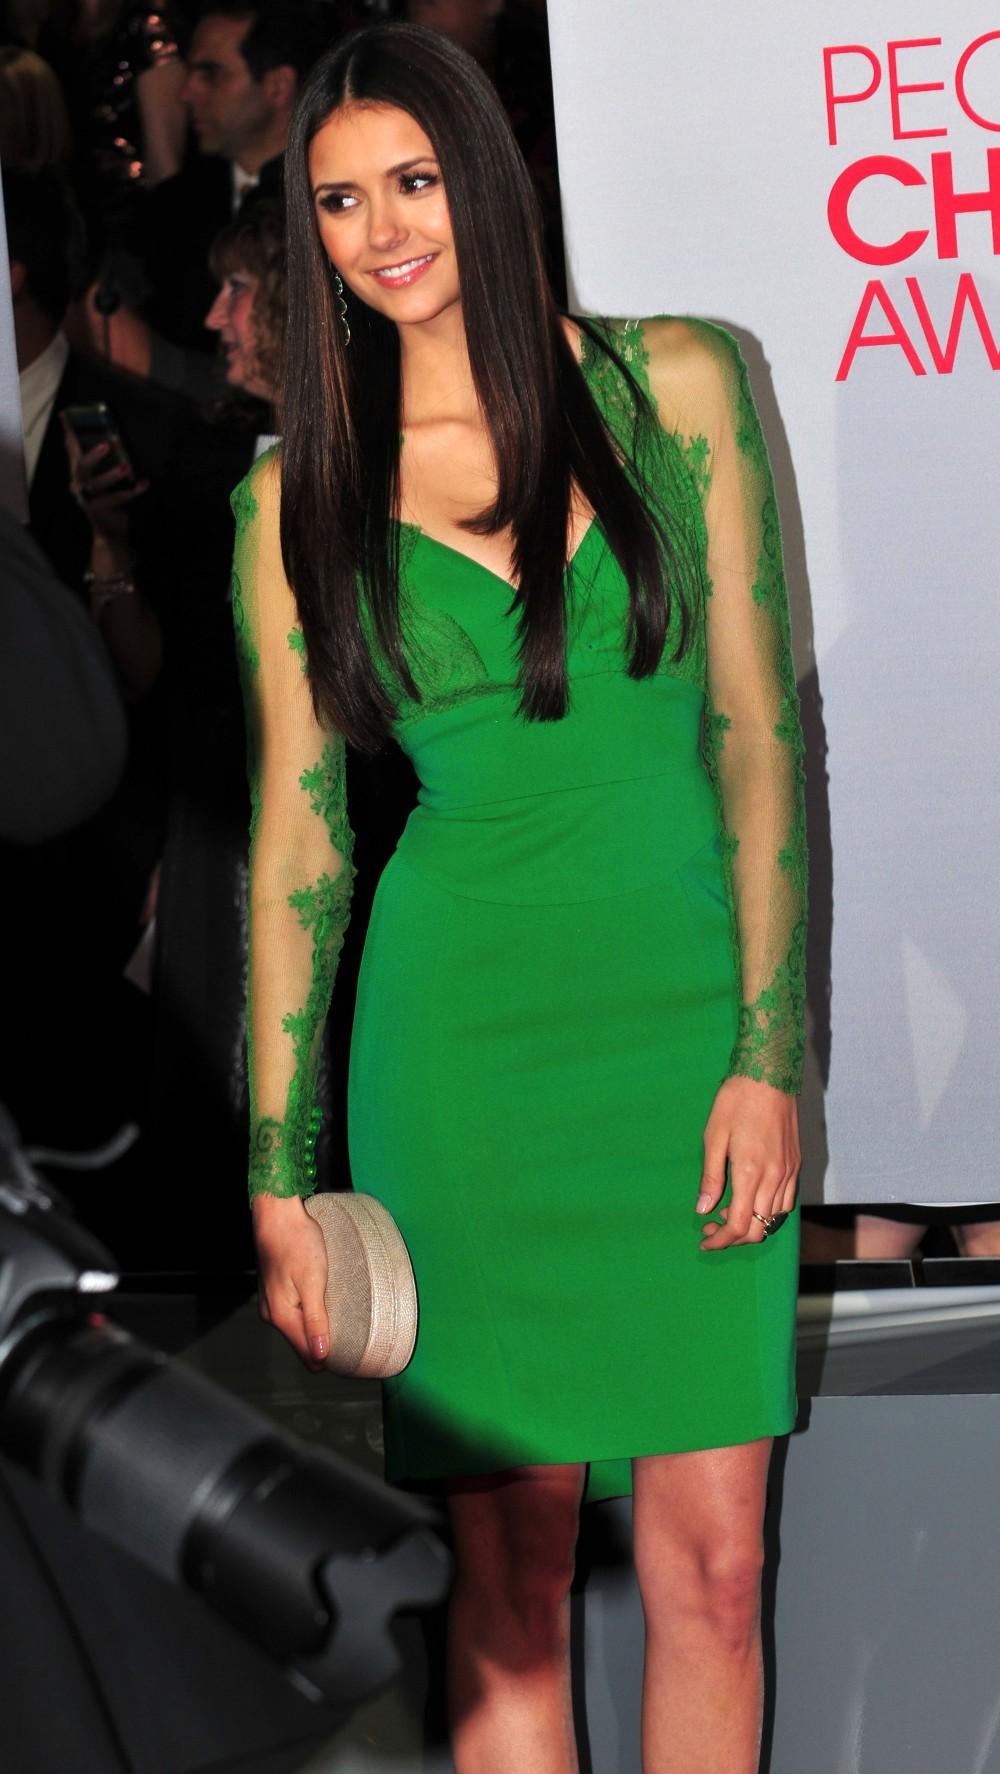 Green Full Sleeves Sheer Knee-Length Celebrity Drseses by Nina Dobrev In Elie Saab 2014 V-neck Sheath Evening Dress Gowns AJ149 135